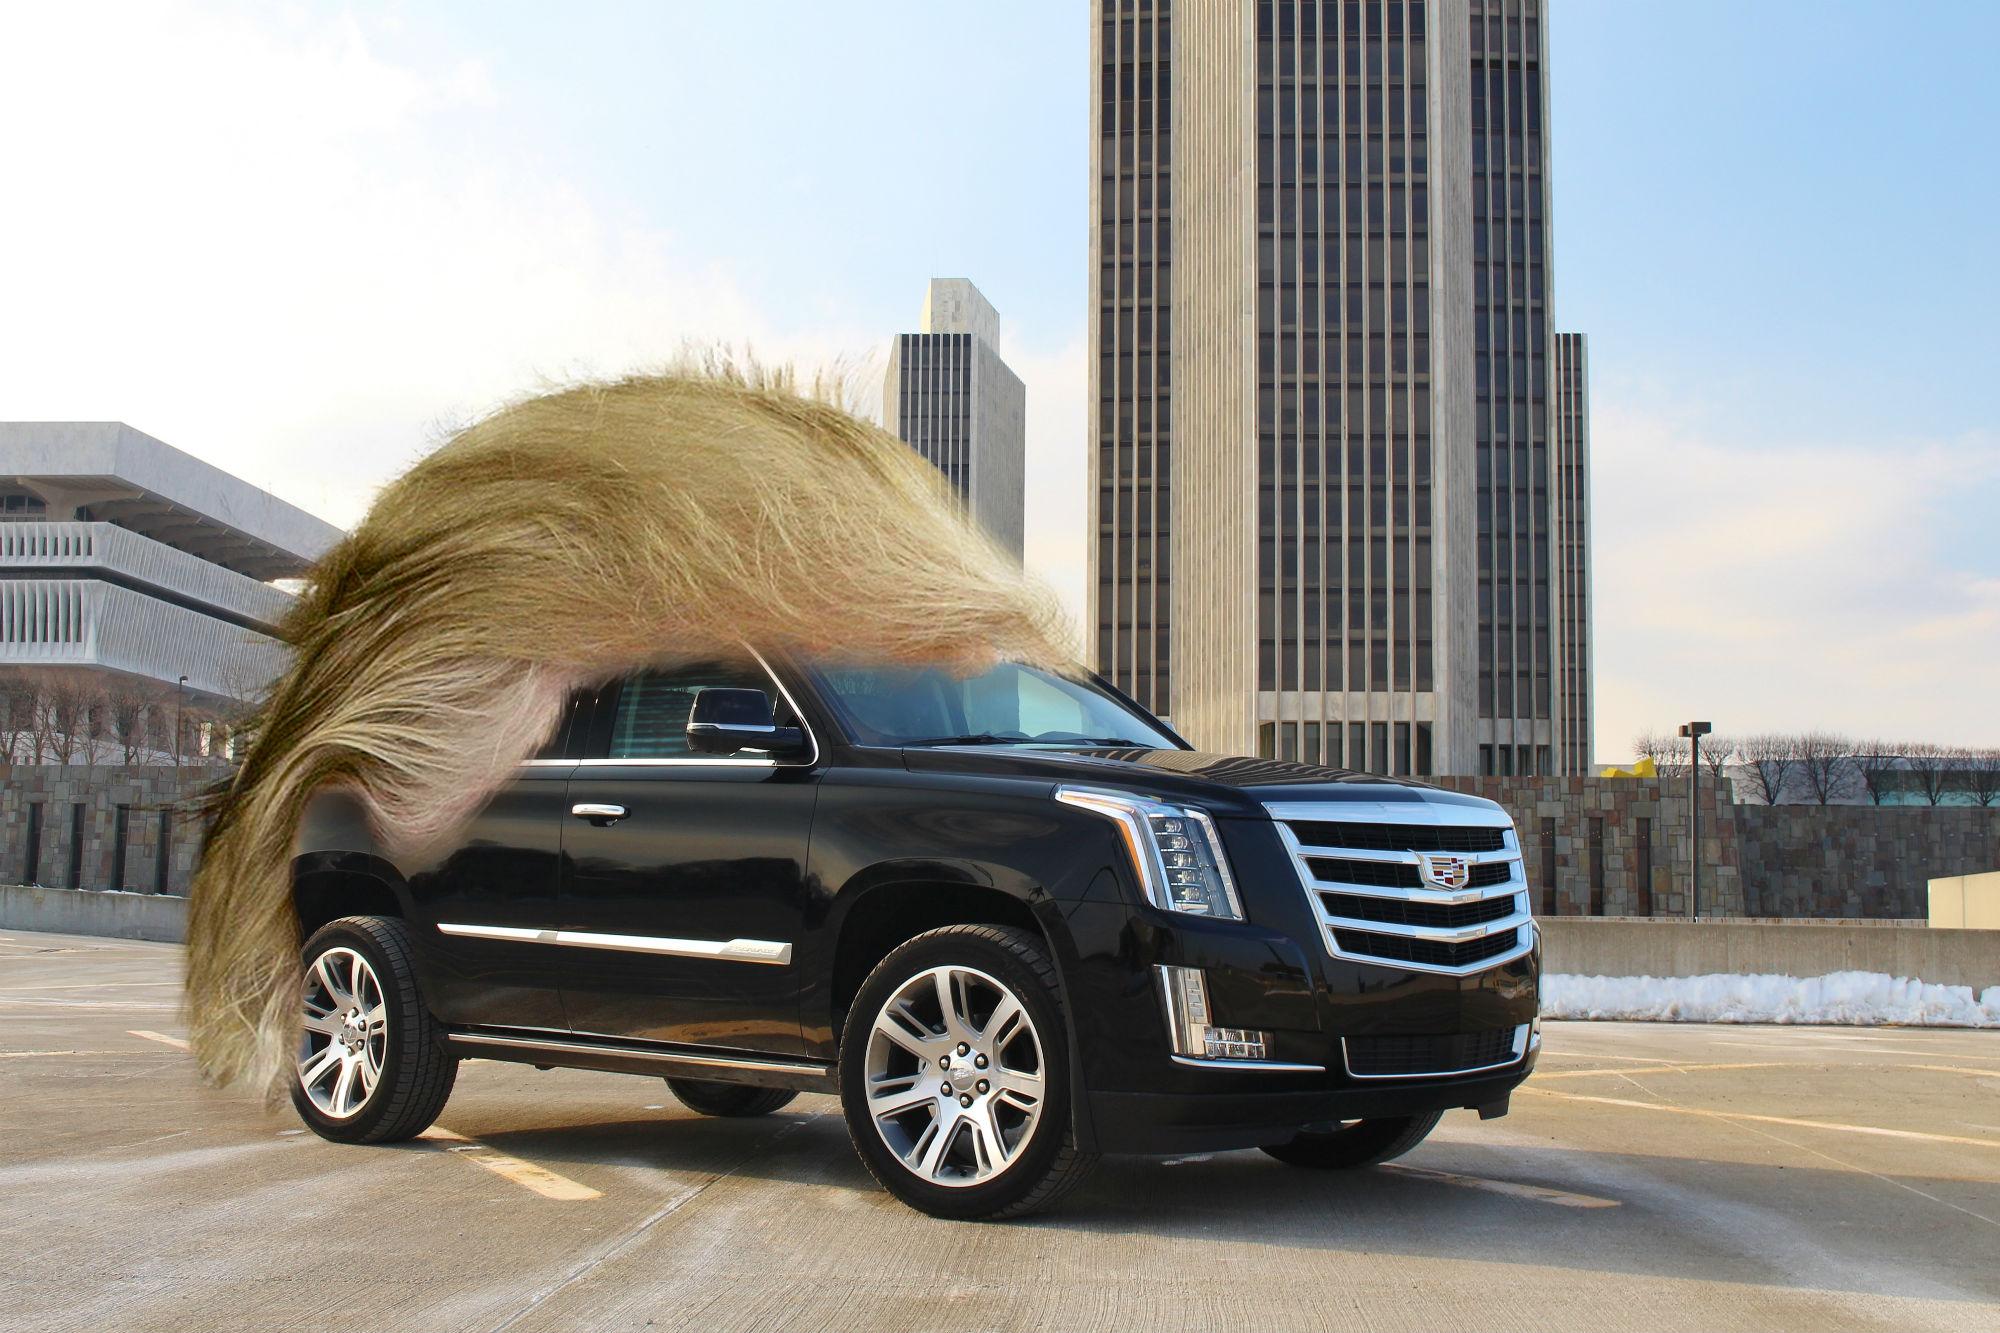 Latest Cadillac Escalade >> If Donald Trump was a car, he'd be a Cadillac Escalade - Car Keys